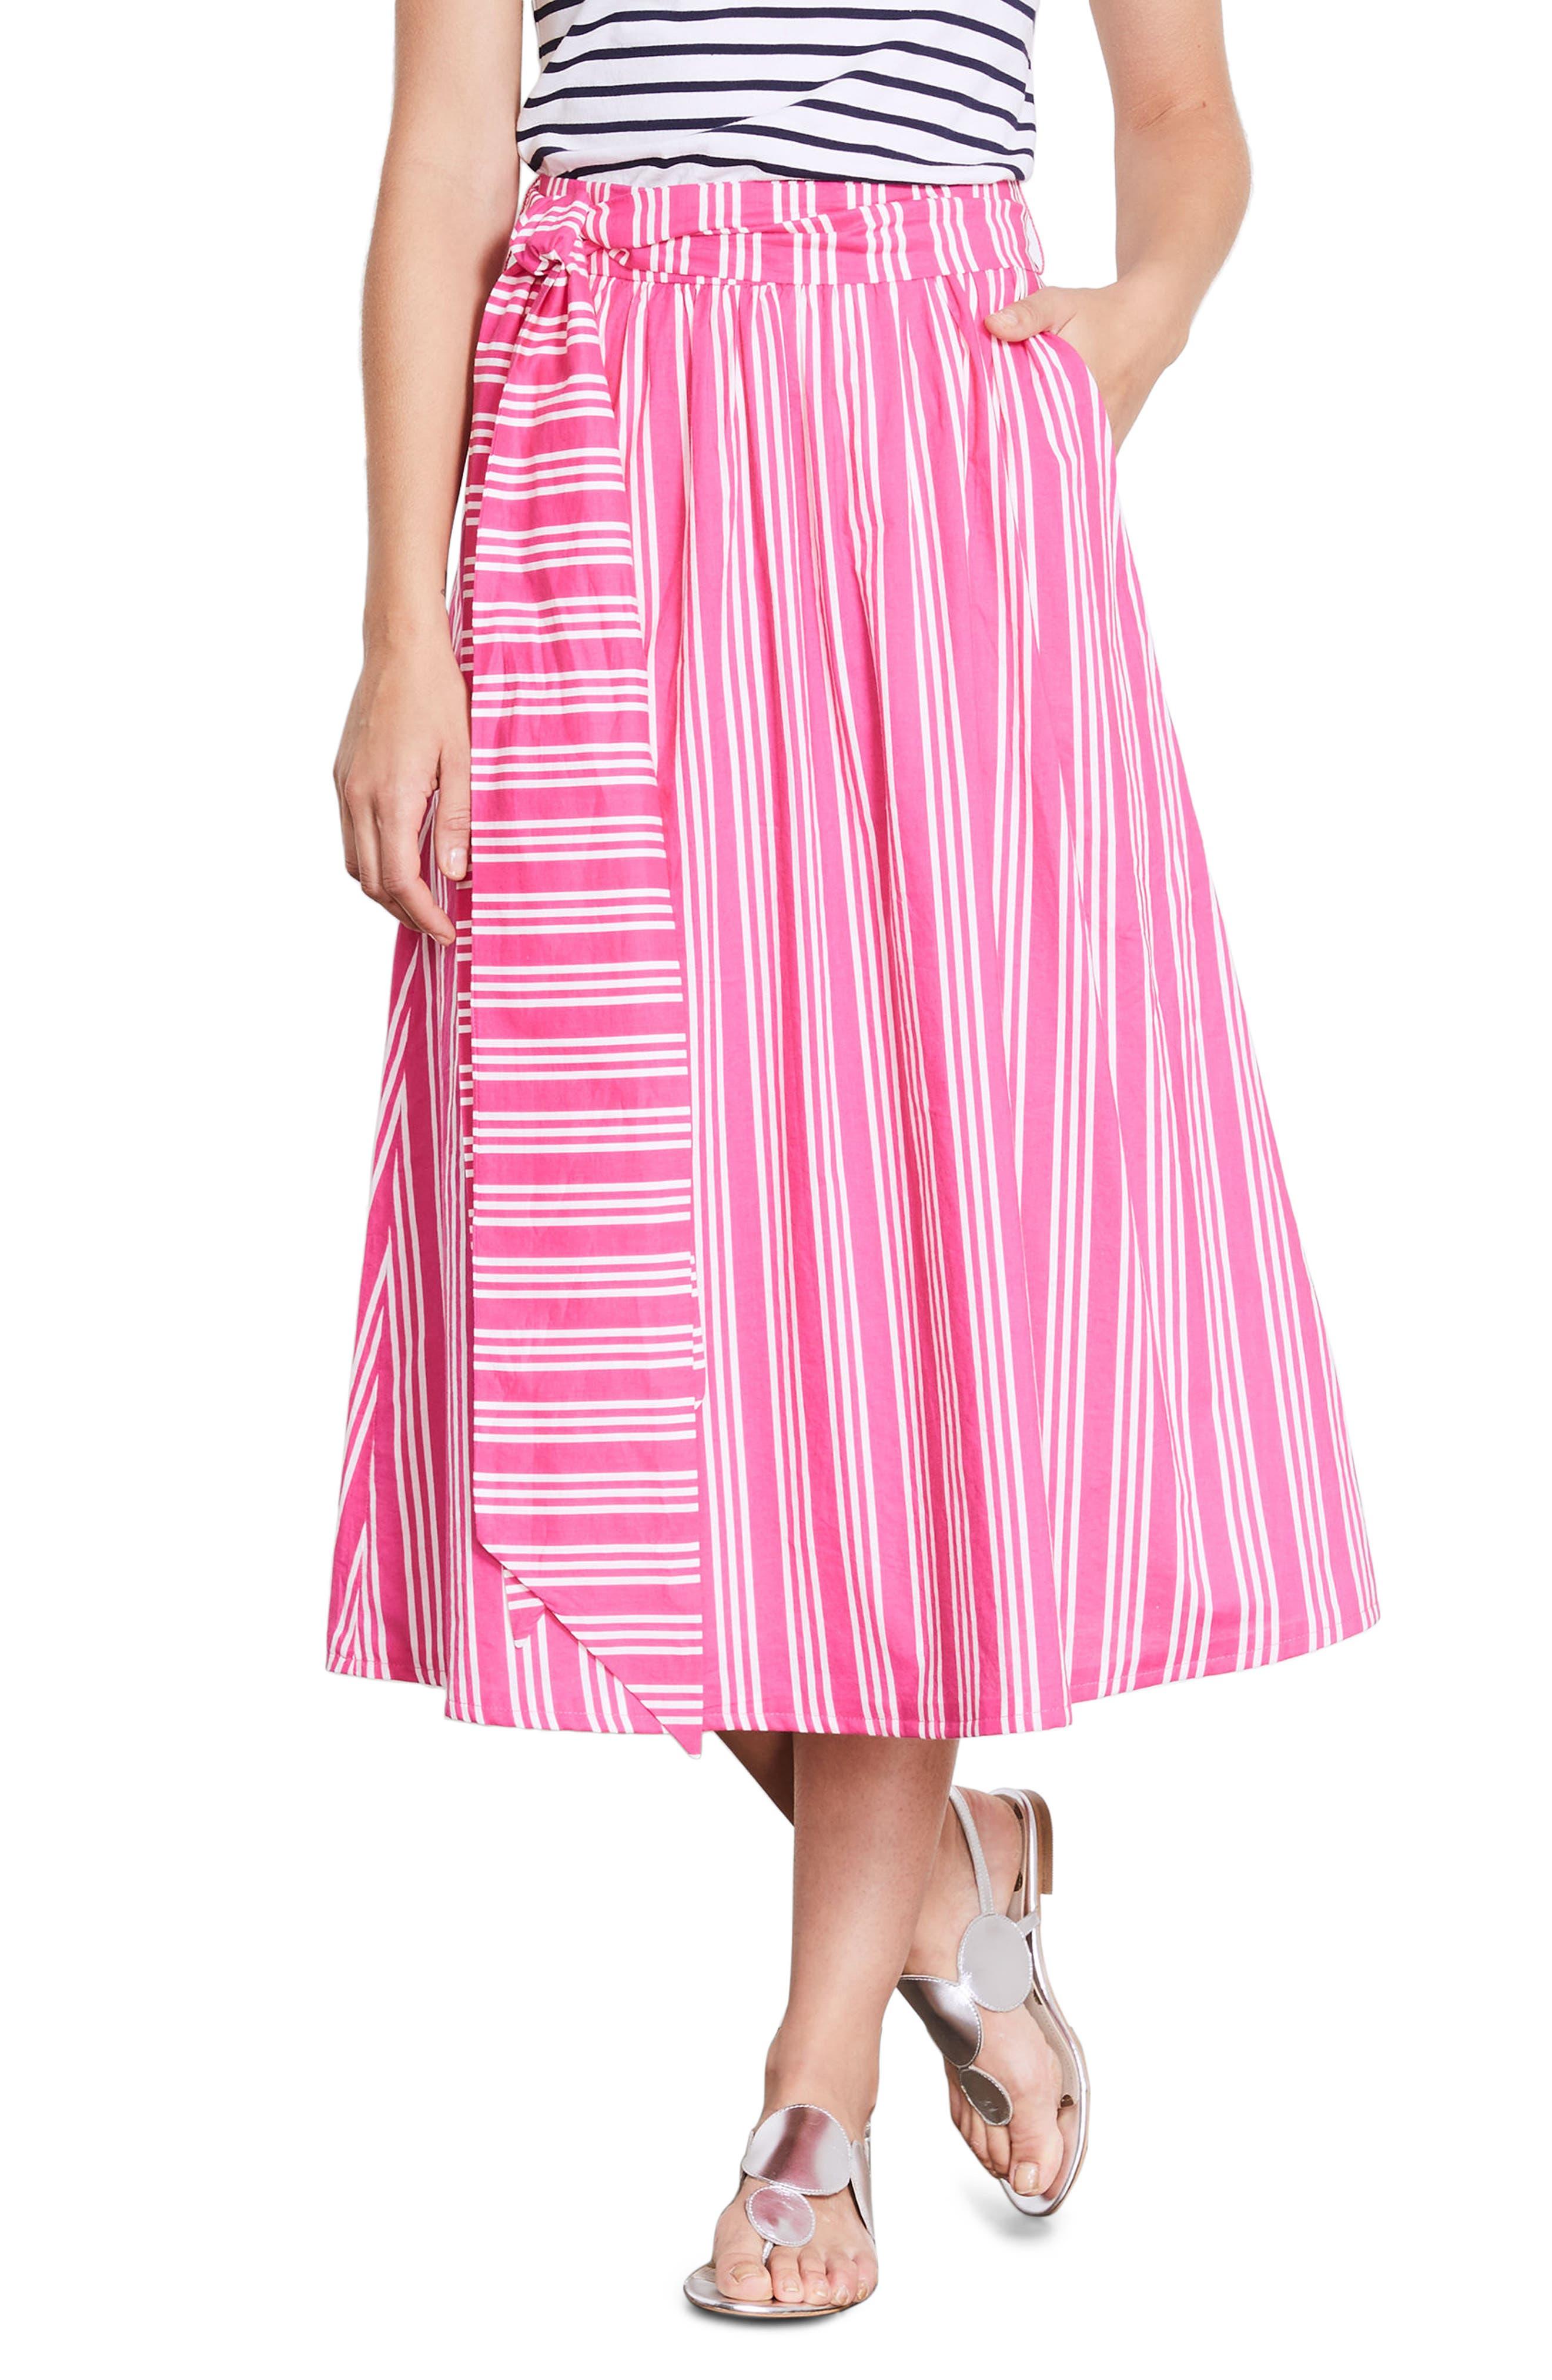 Kiera Midi Skirt,                         Main,                         color, Party Pink And Ecru